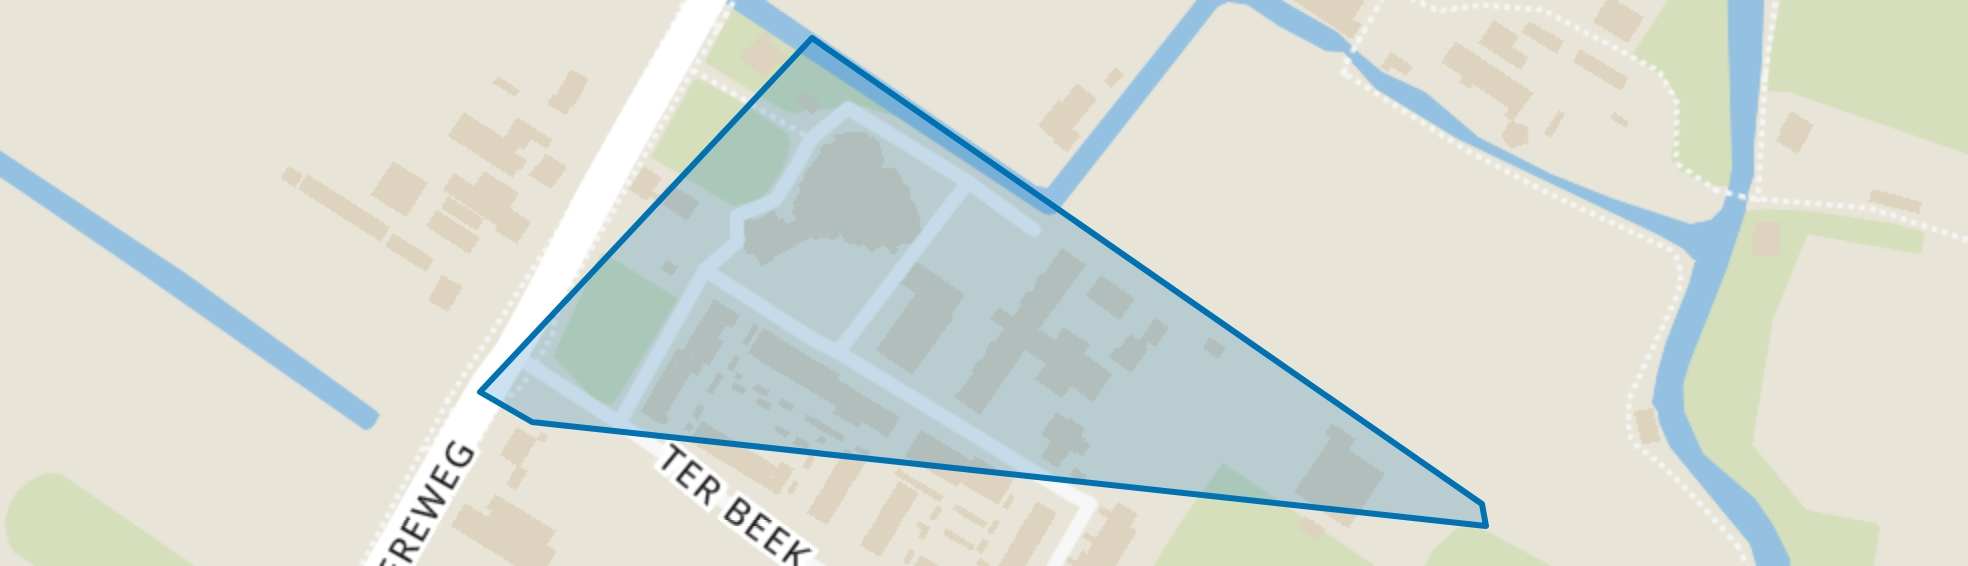 Ter Beek, Lisse map